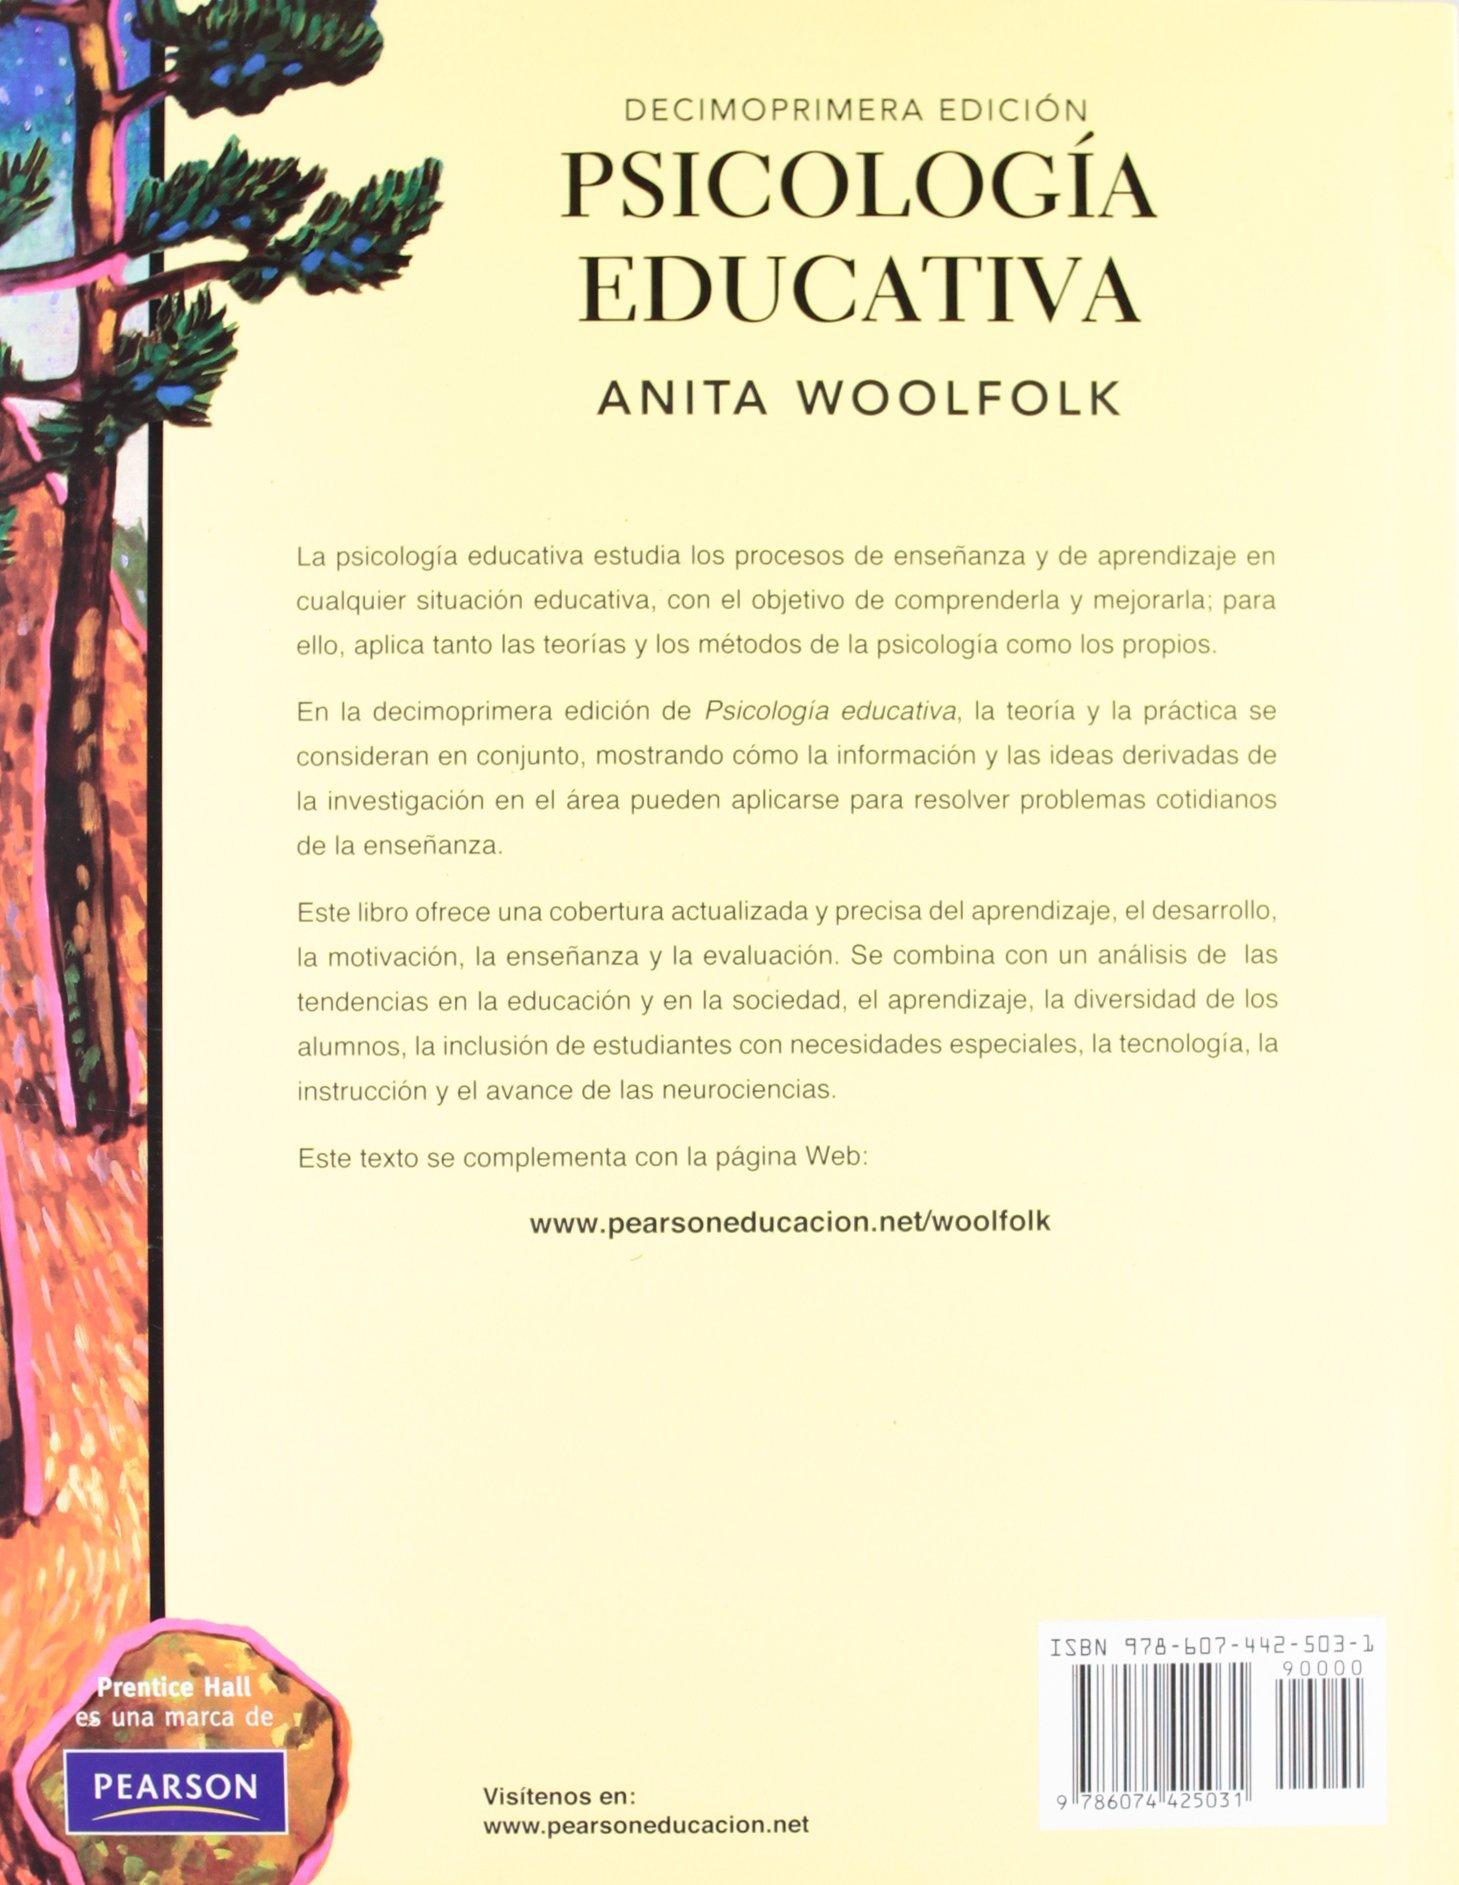 libro psicologia educativa anita e.woolfolk